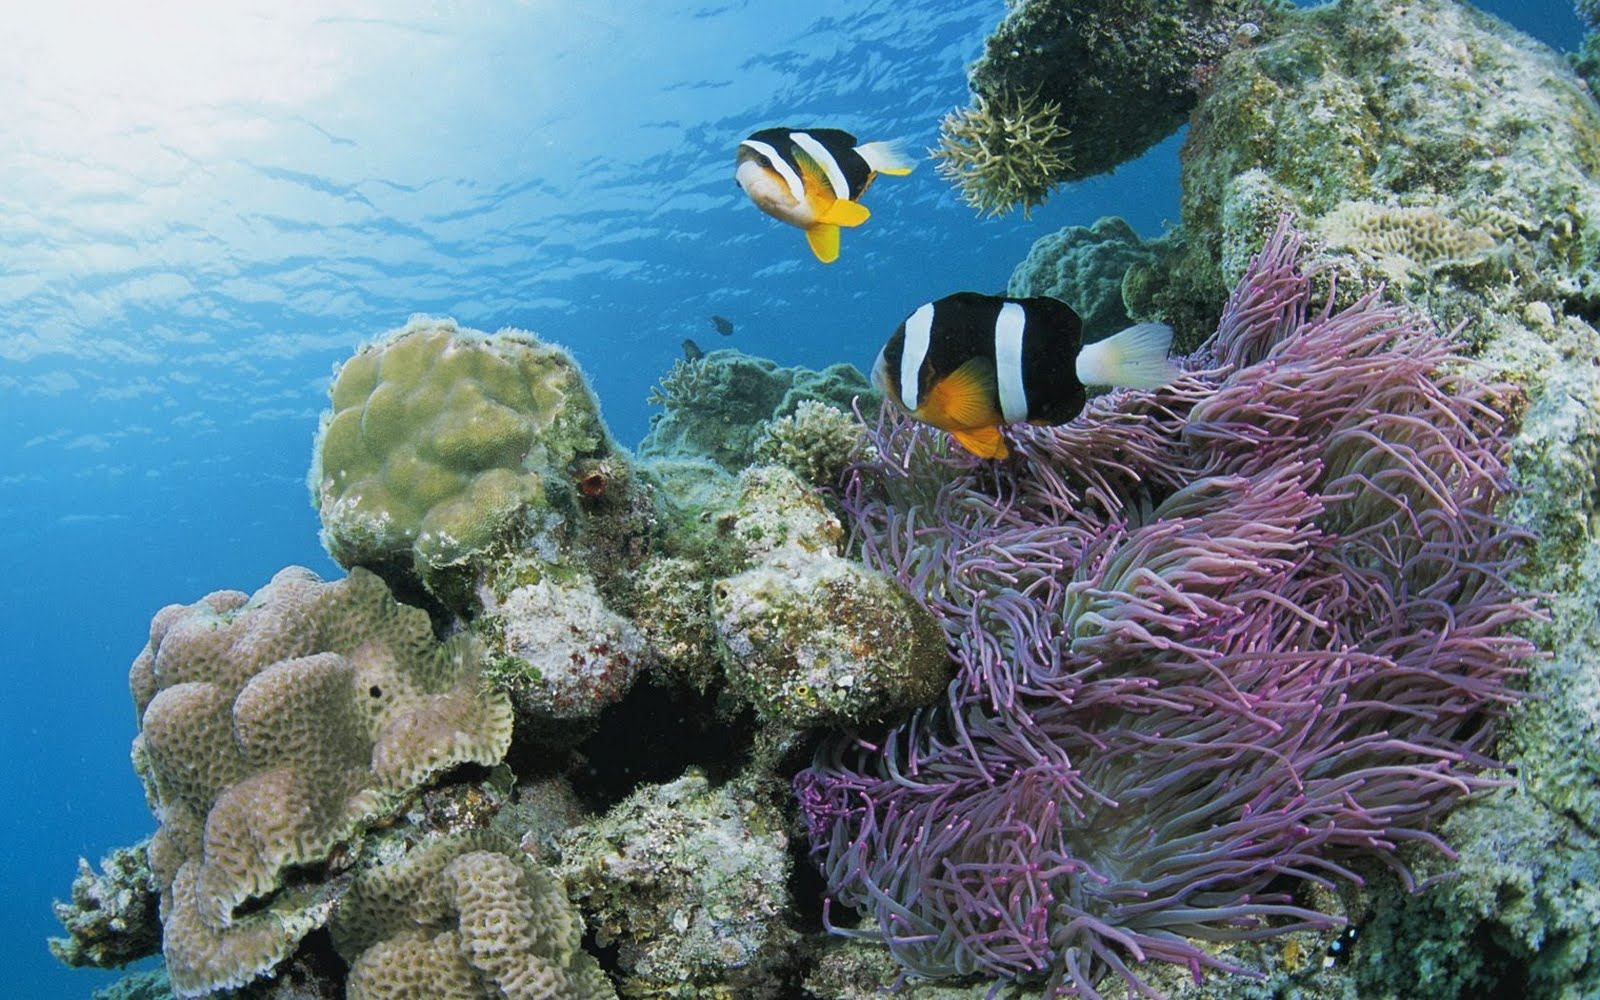 Wallpaper Hd Under Sea